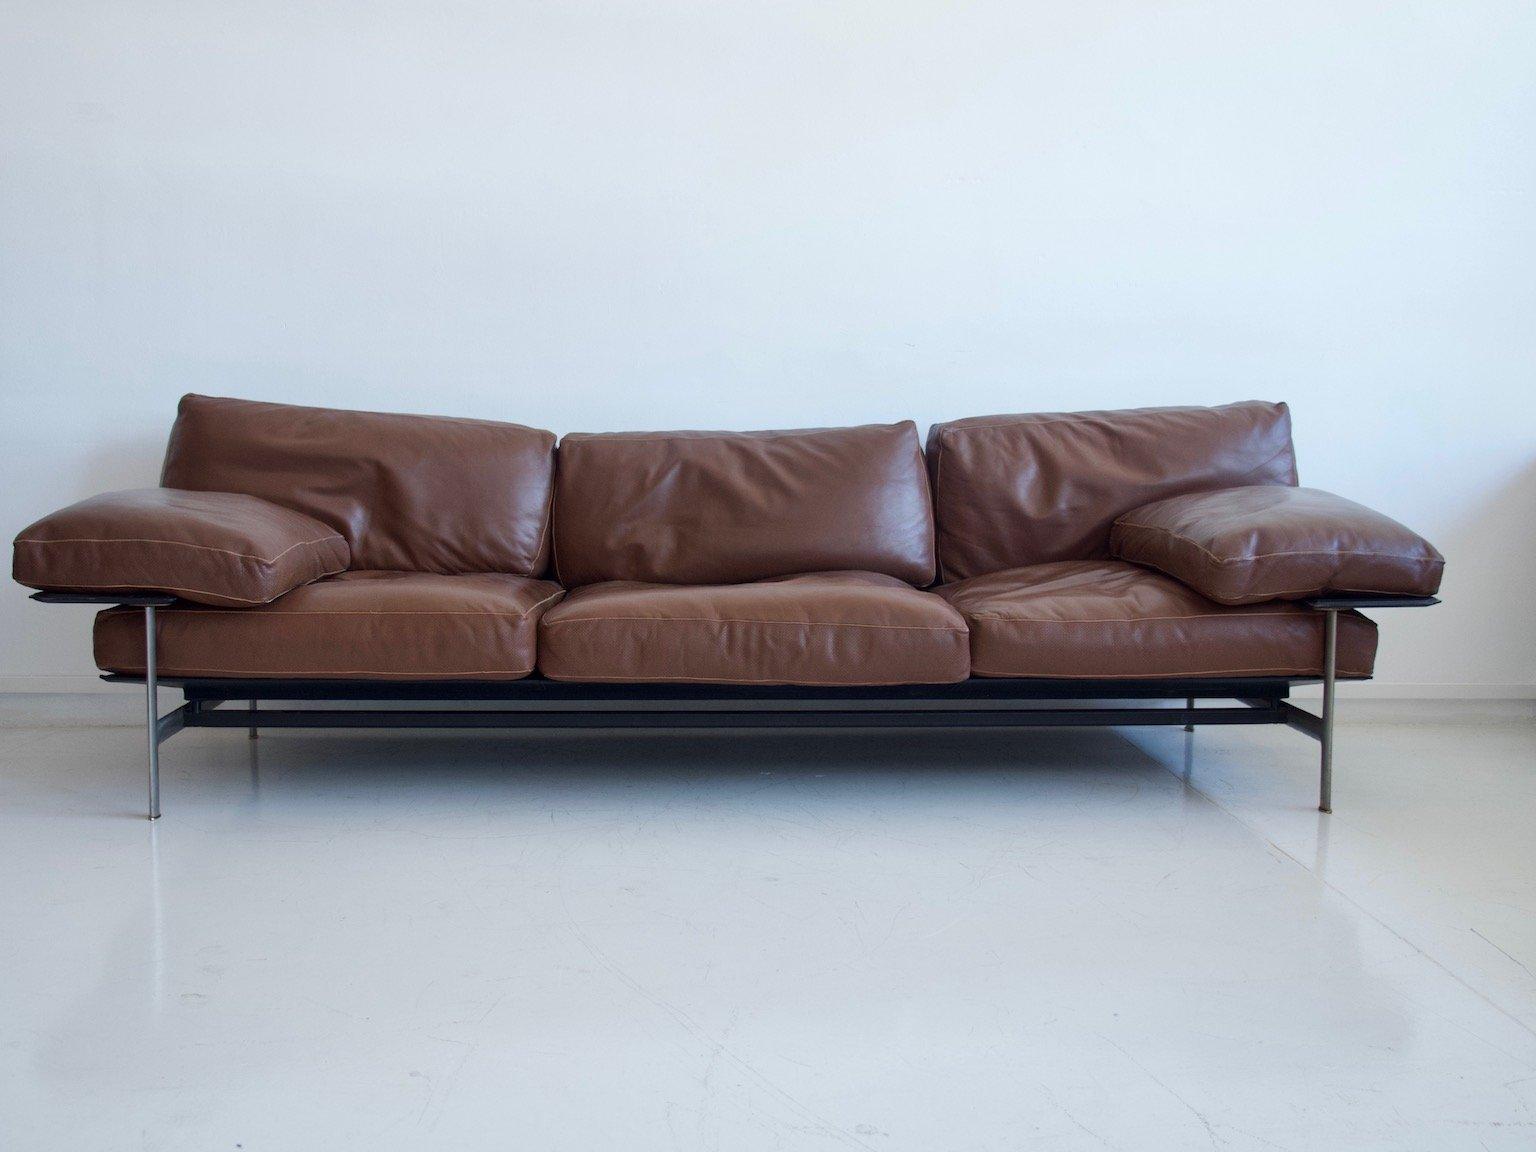 Diesis Leather Sofa By Antonio Citterio Amp Paolo Nava Brown